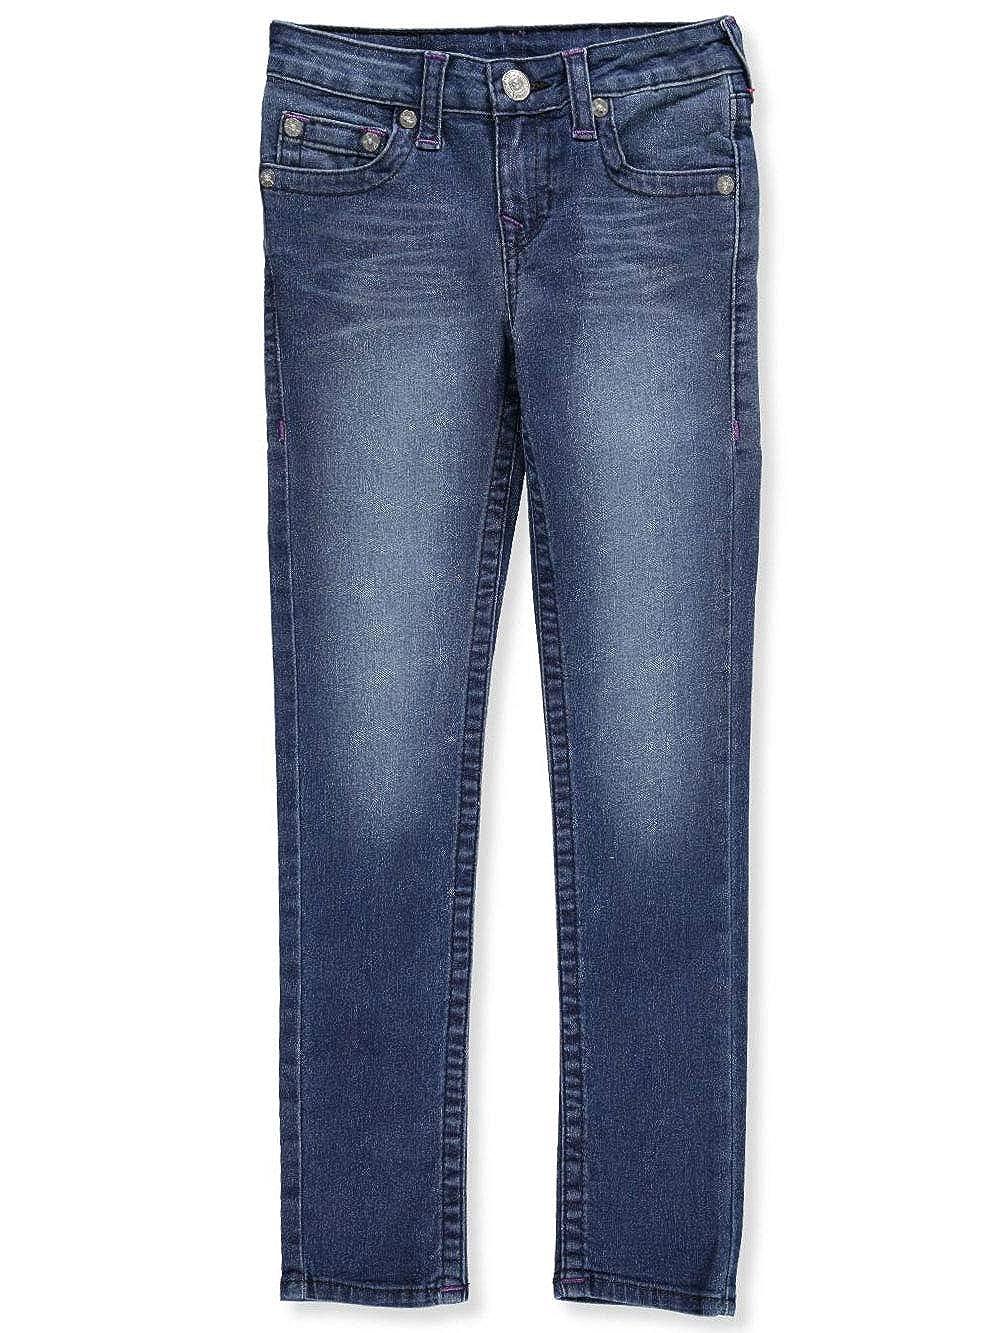 True Religion Girls' Jeans